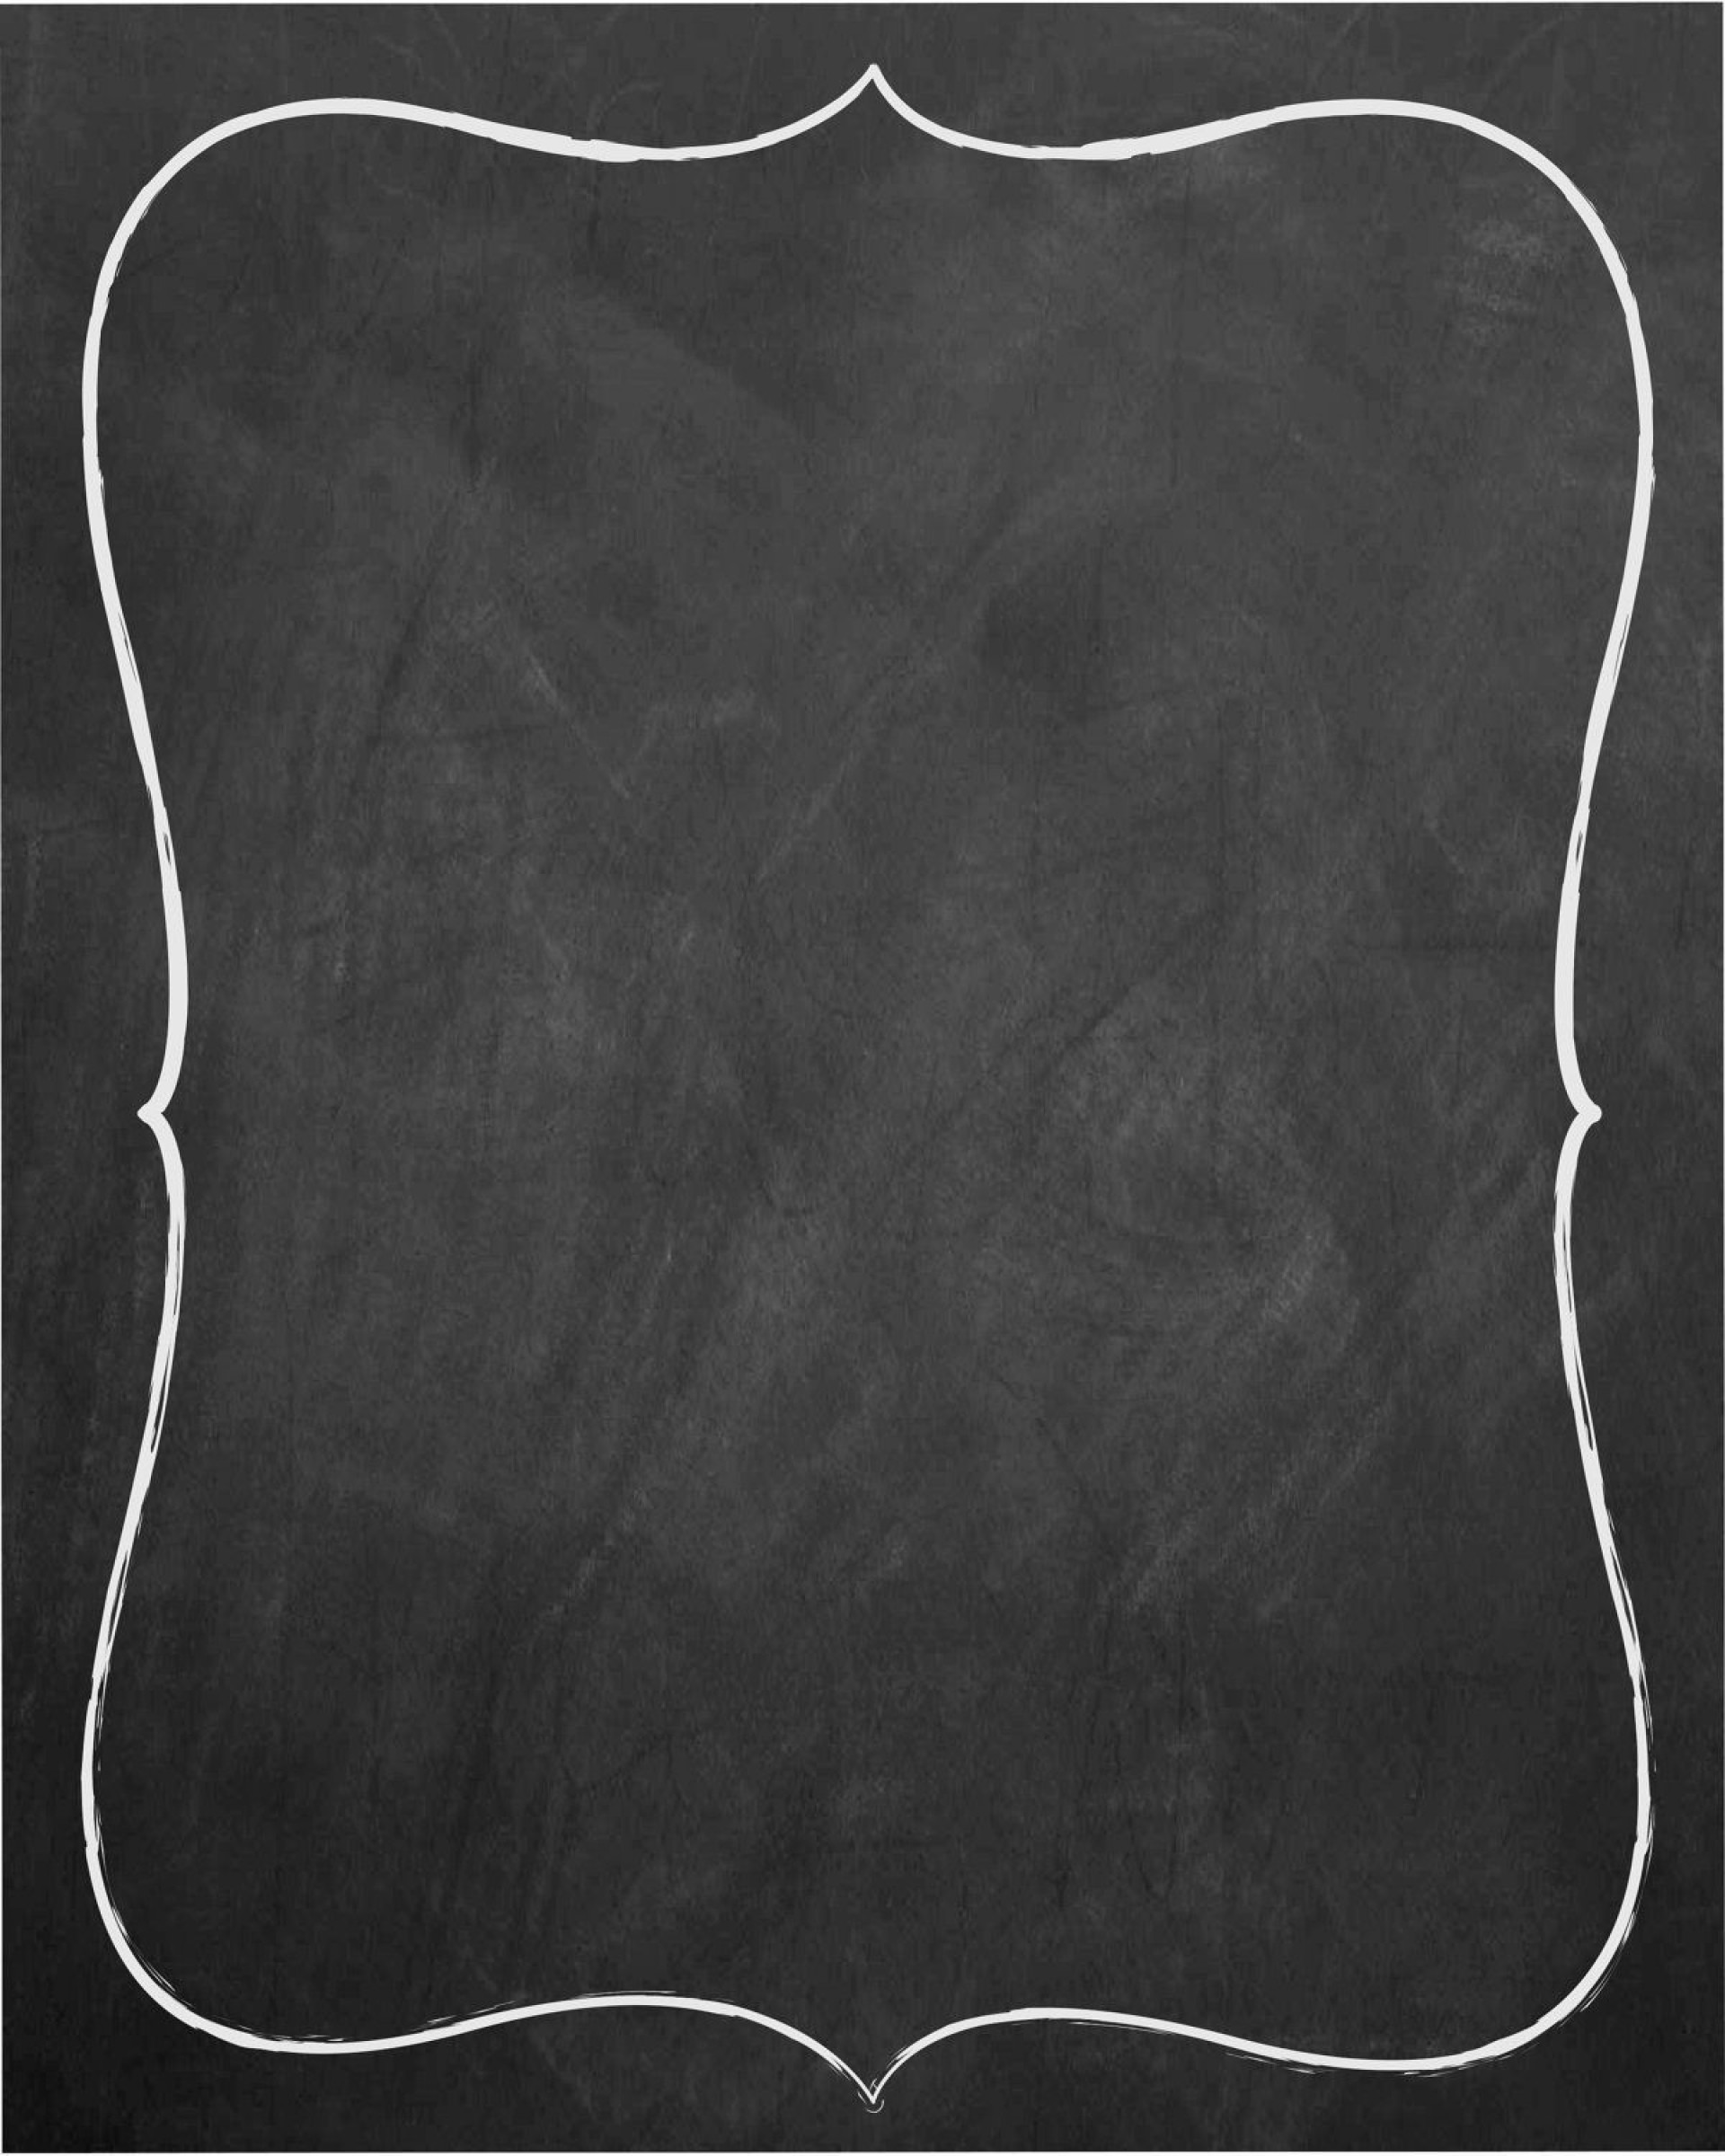 007 Unforgettable Chalkboard Invitation Template Free Idea  Download Wedding Editable1920